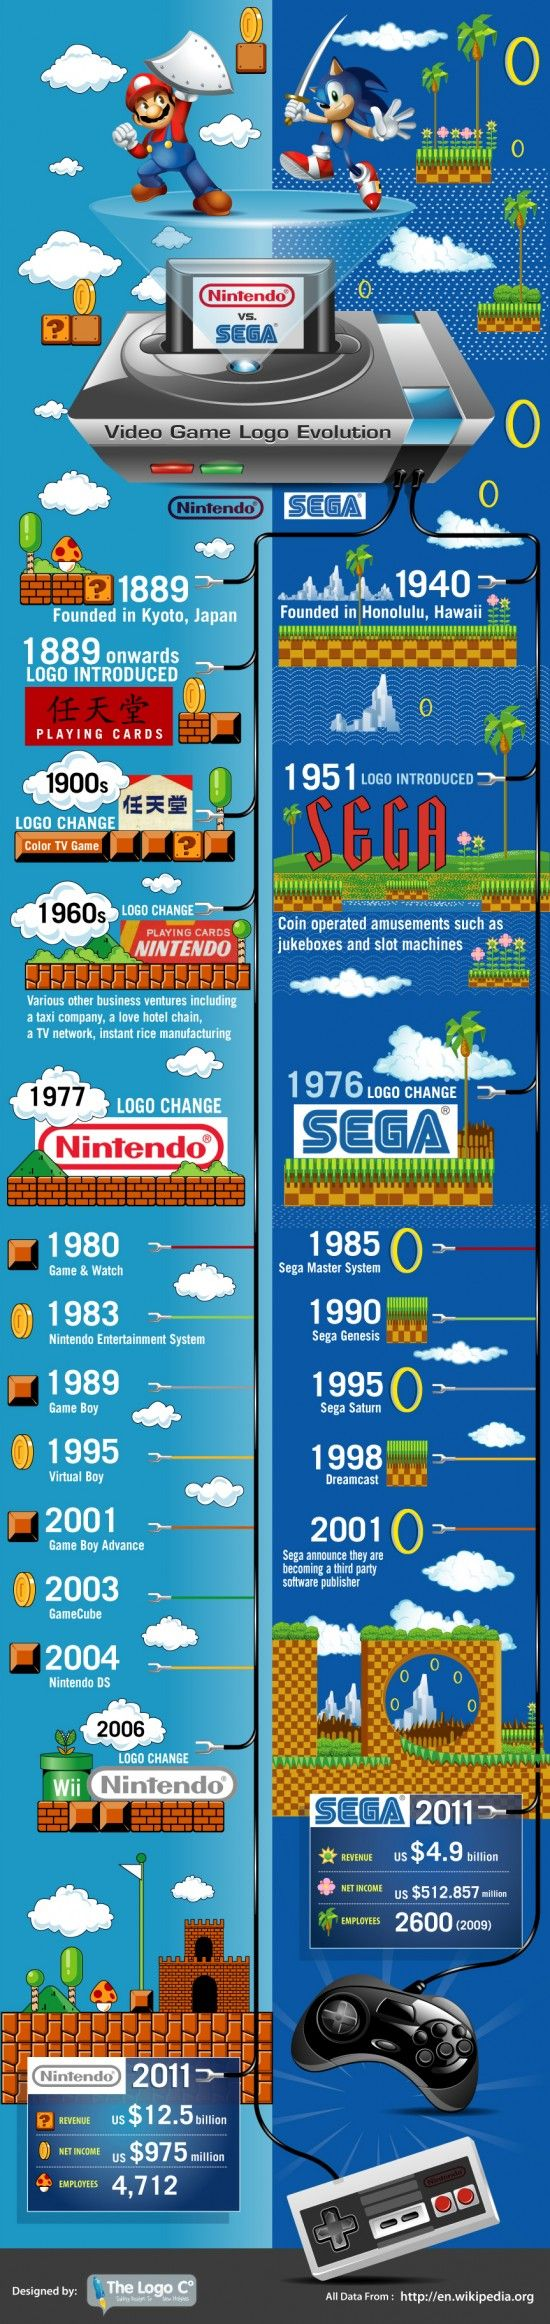 Sega vs Nintendo Logo Evolution Infographic {H}